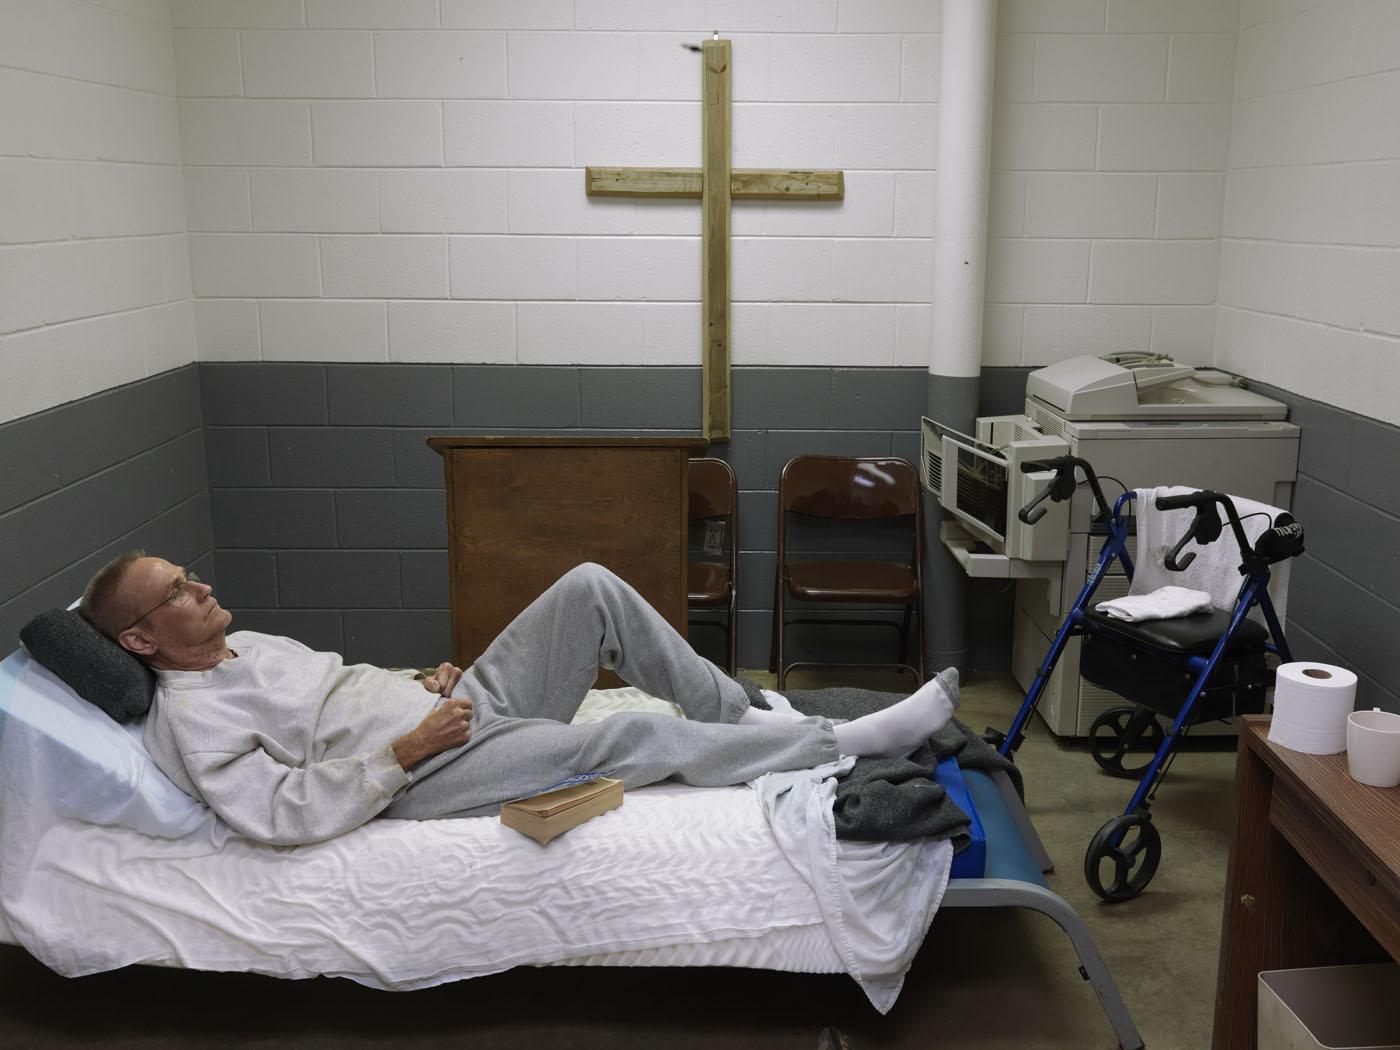 Putnam County jail in Eatonton, Georgia